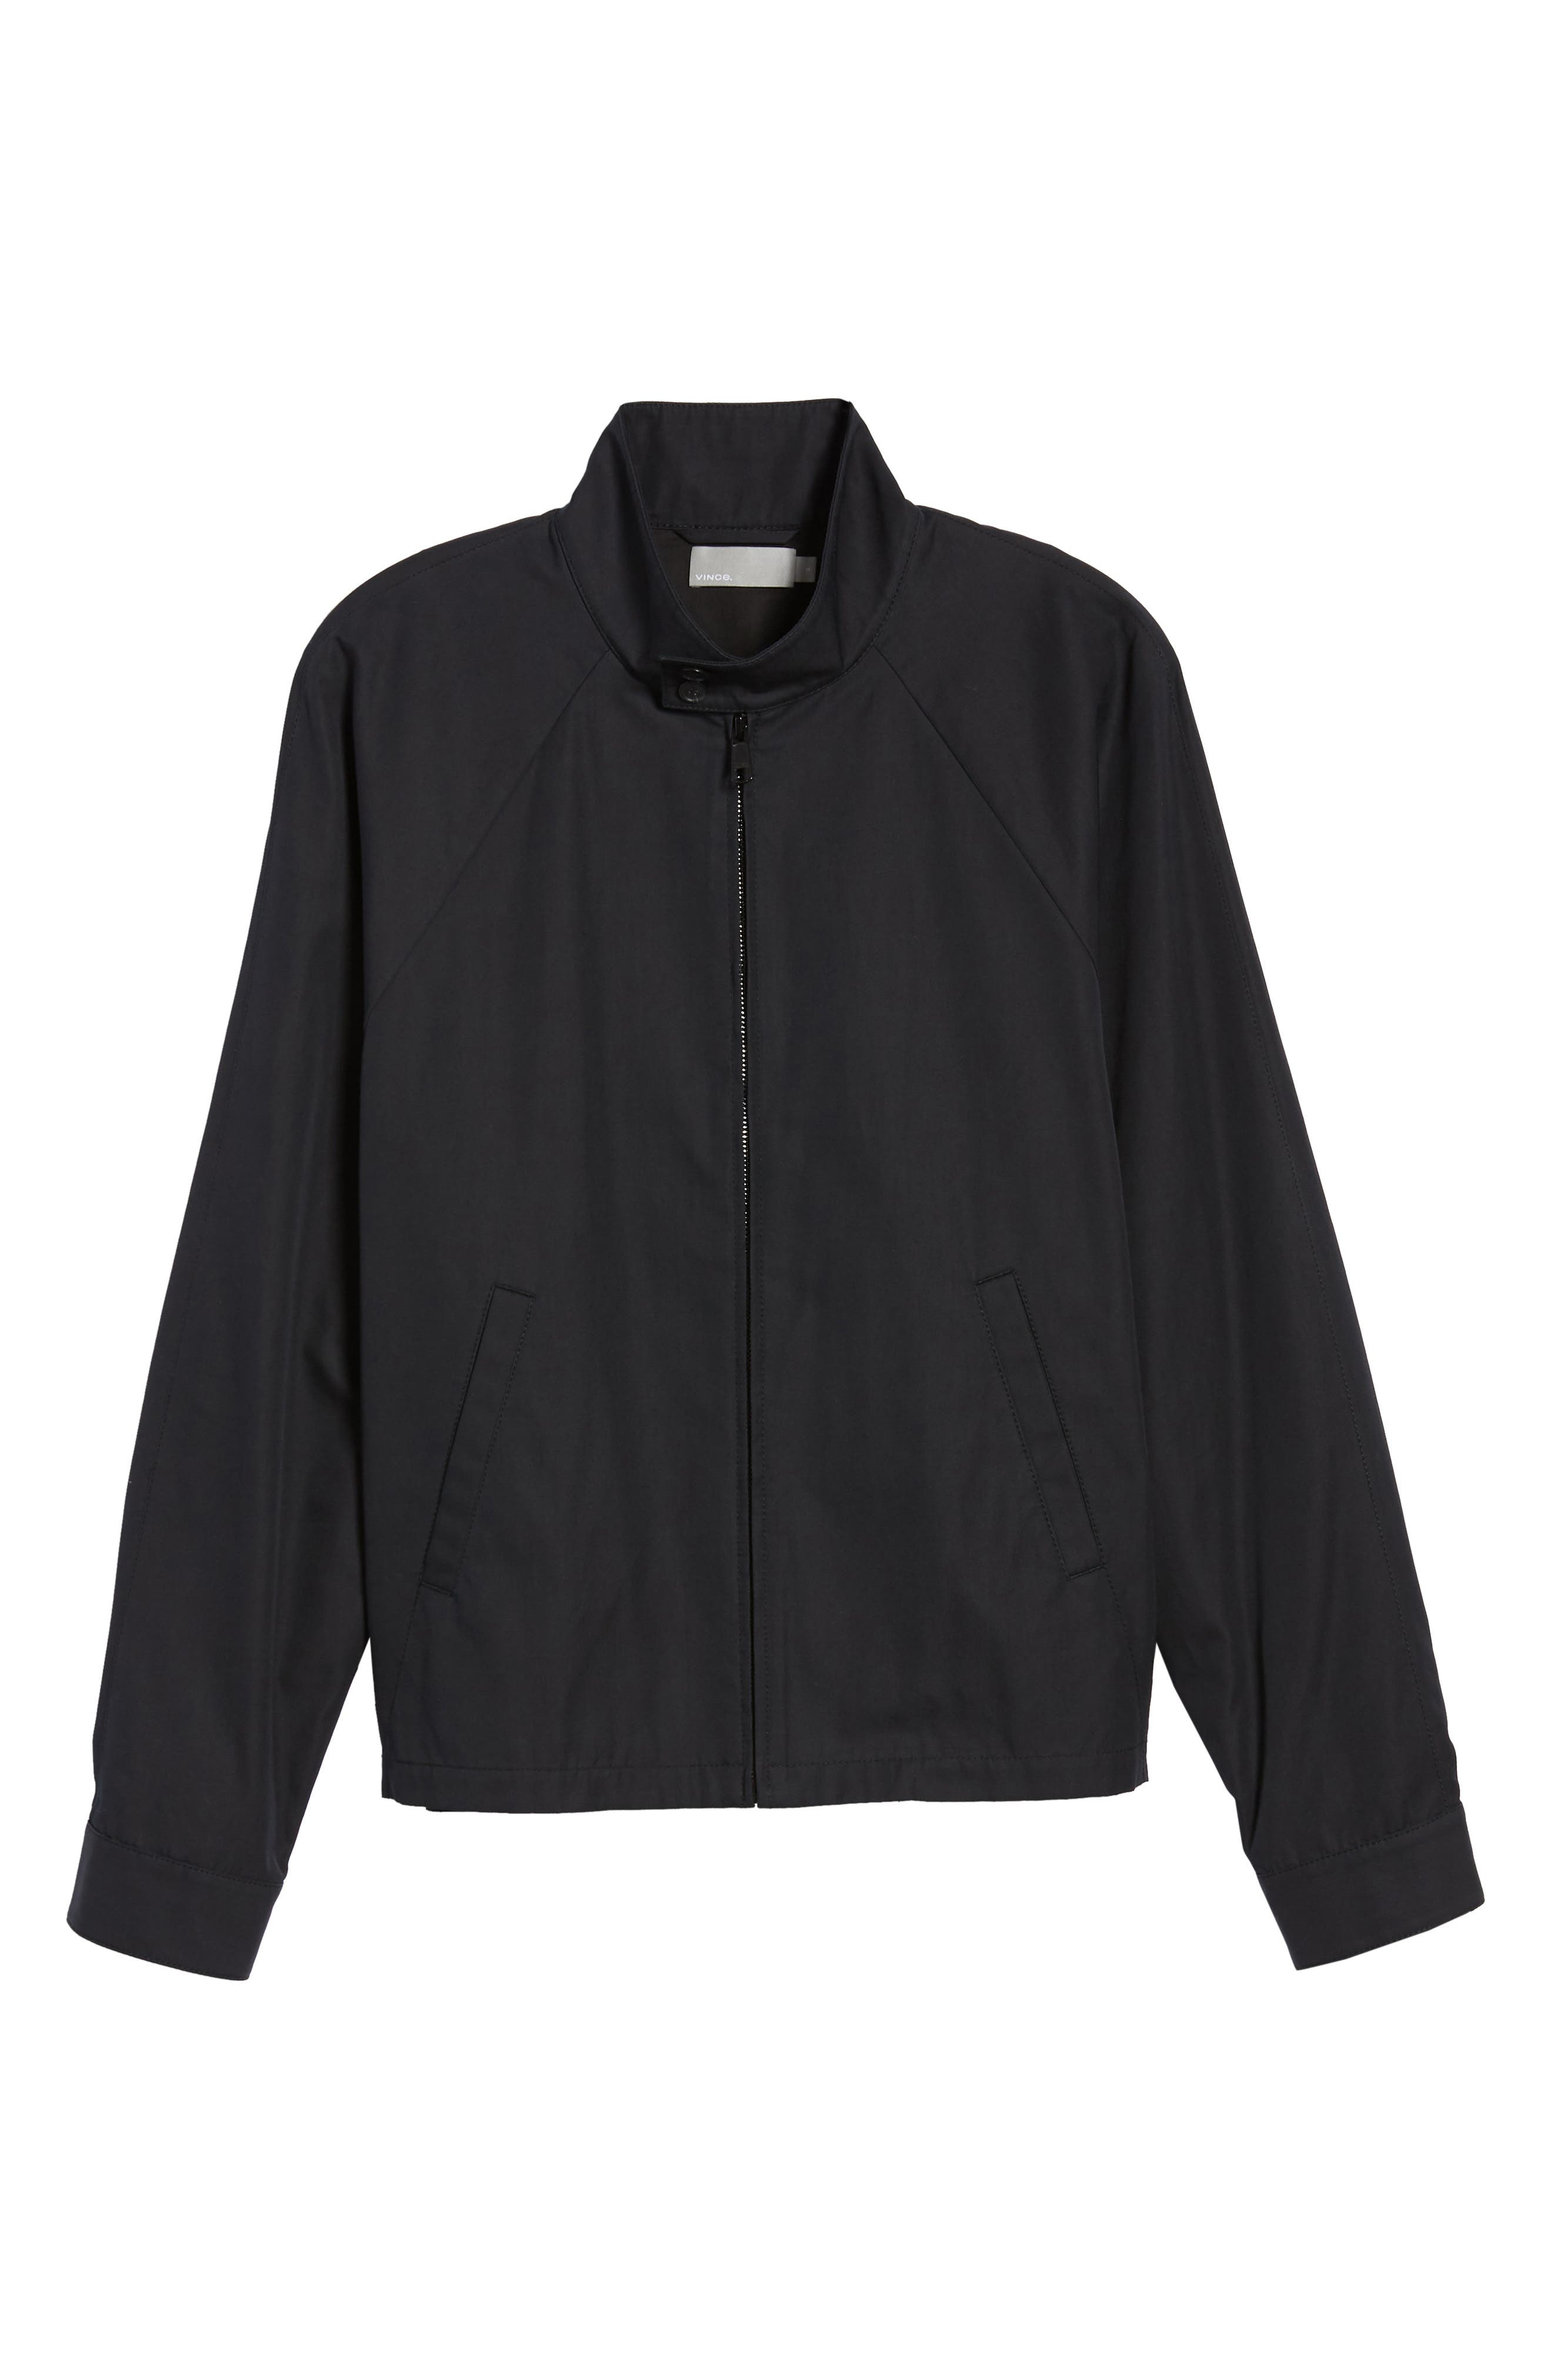 Regular Fit Jacket,                             Alternate thumbnail 6, color,                             Black